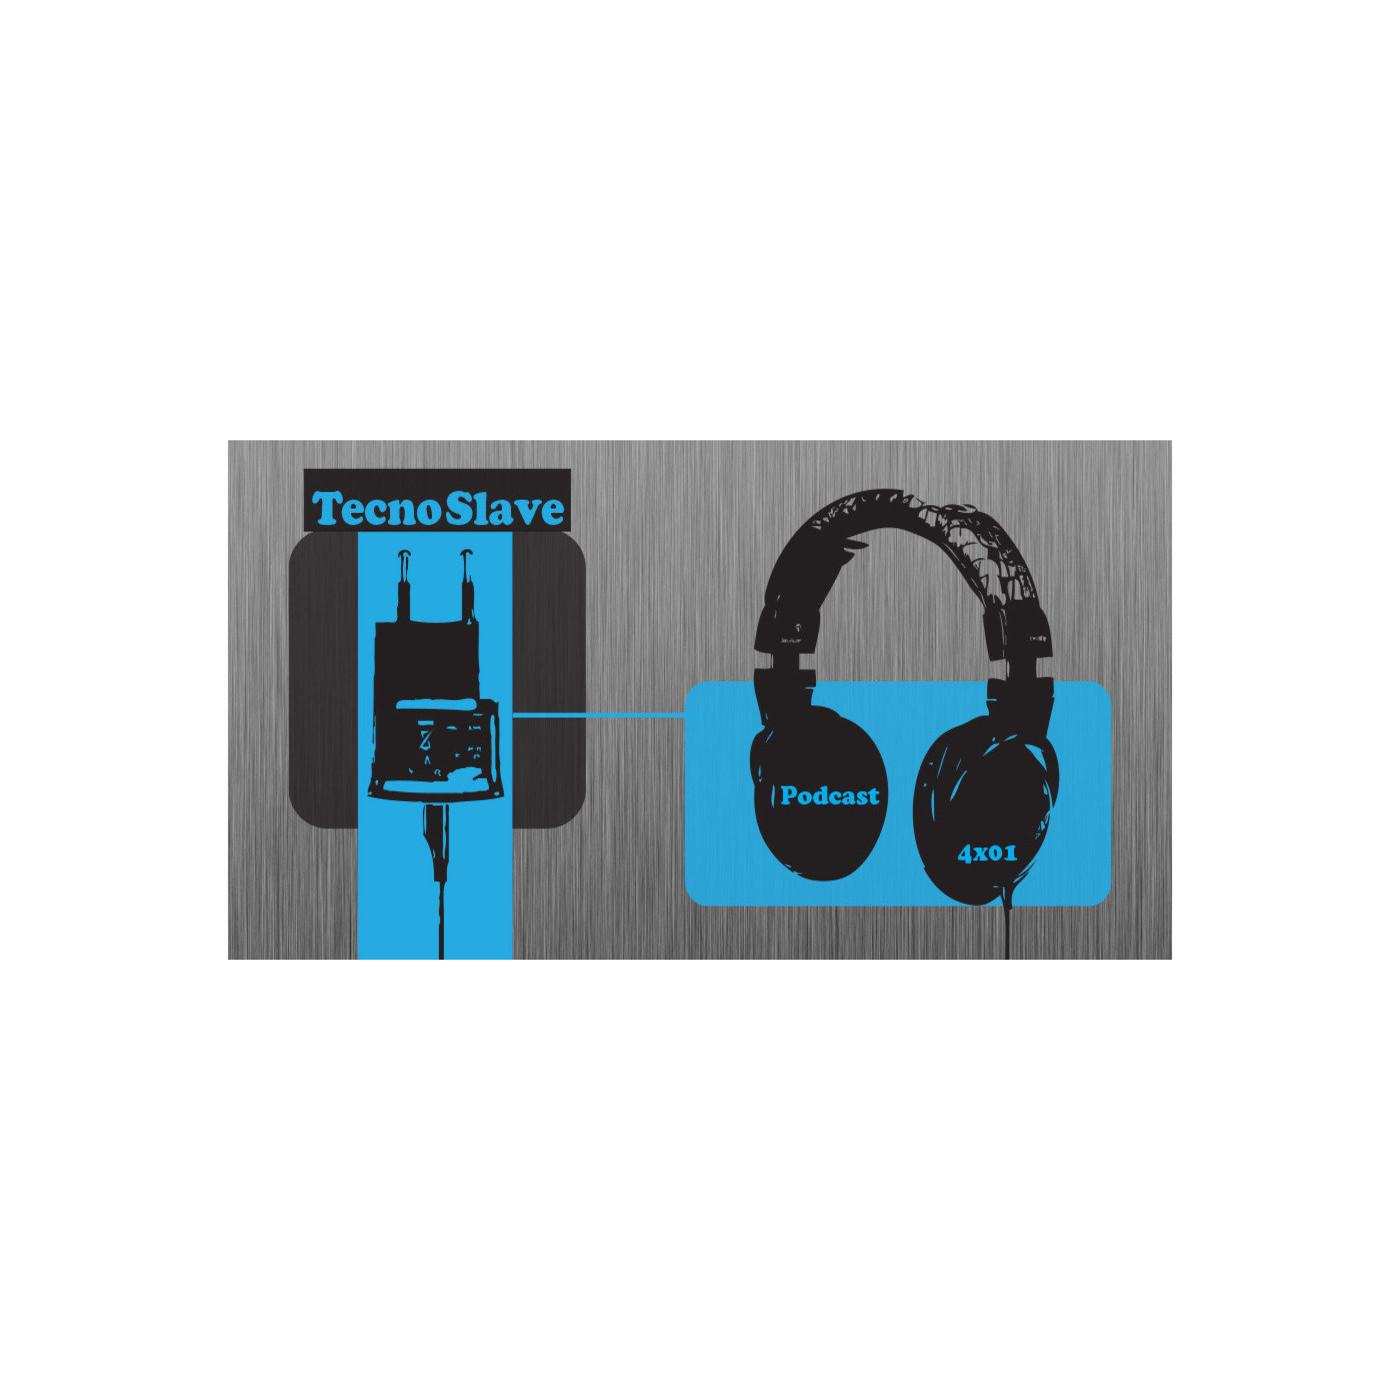 <![CDATA[TecnoSlave Podcast]]>